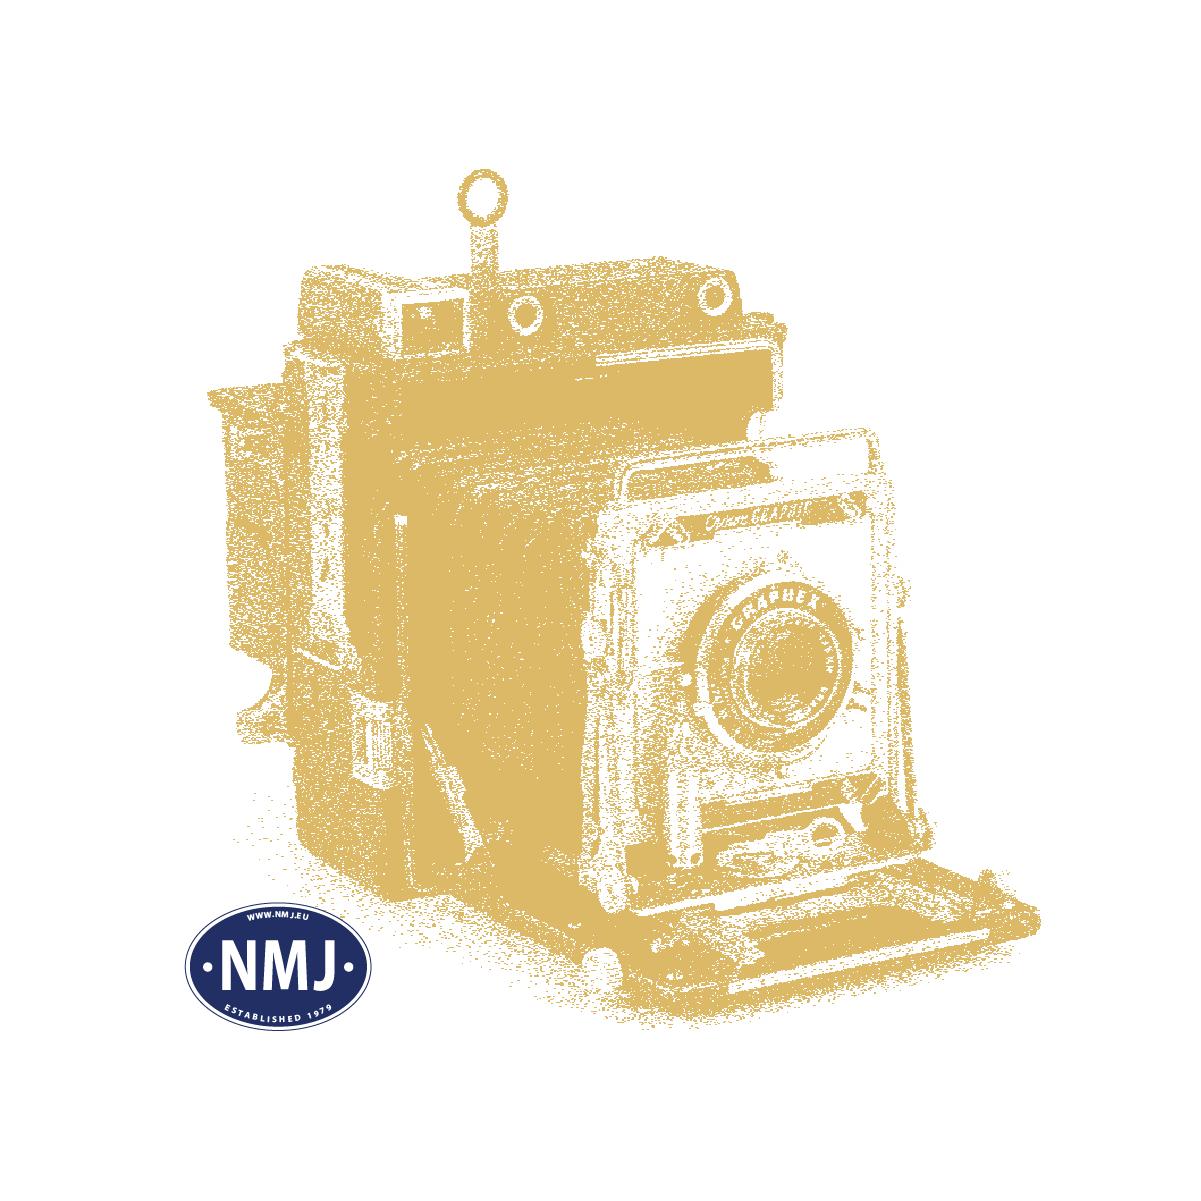 NOC15240 - Reisende